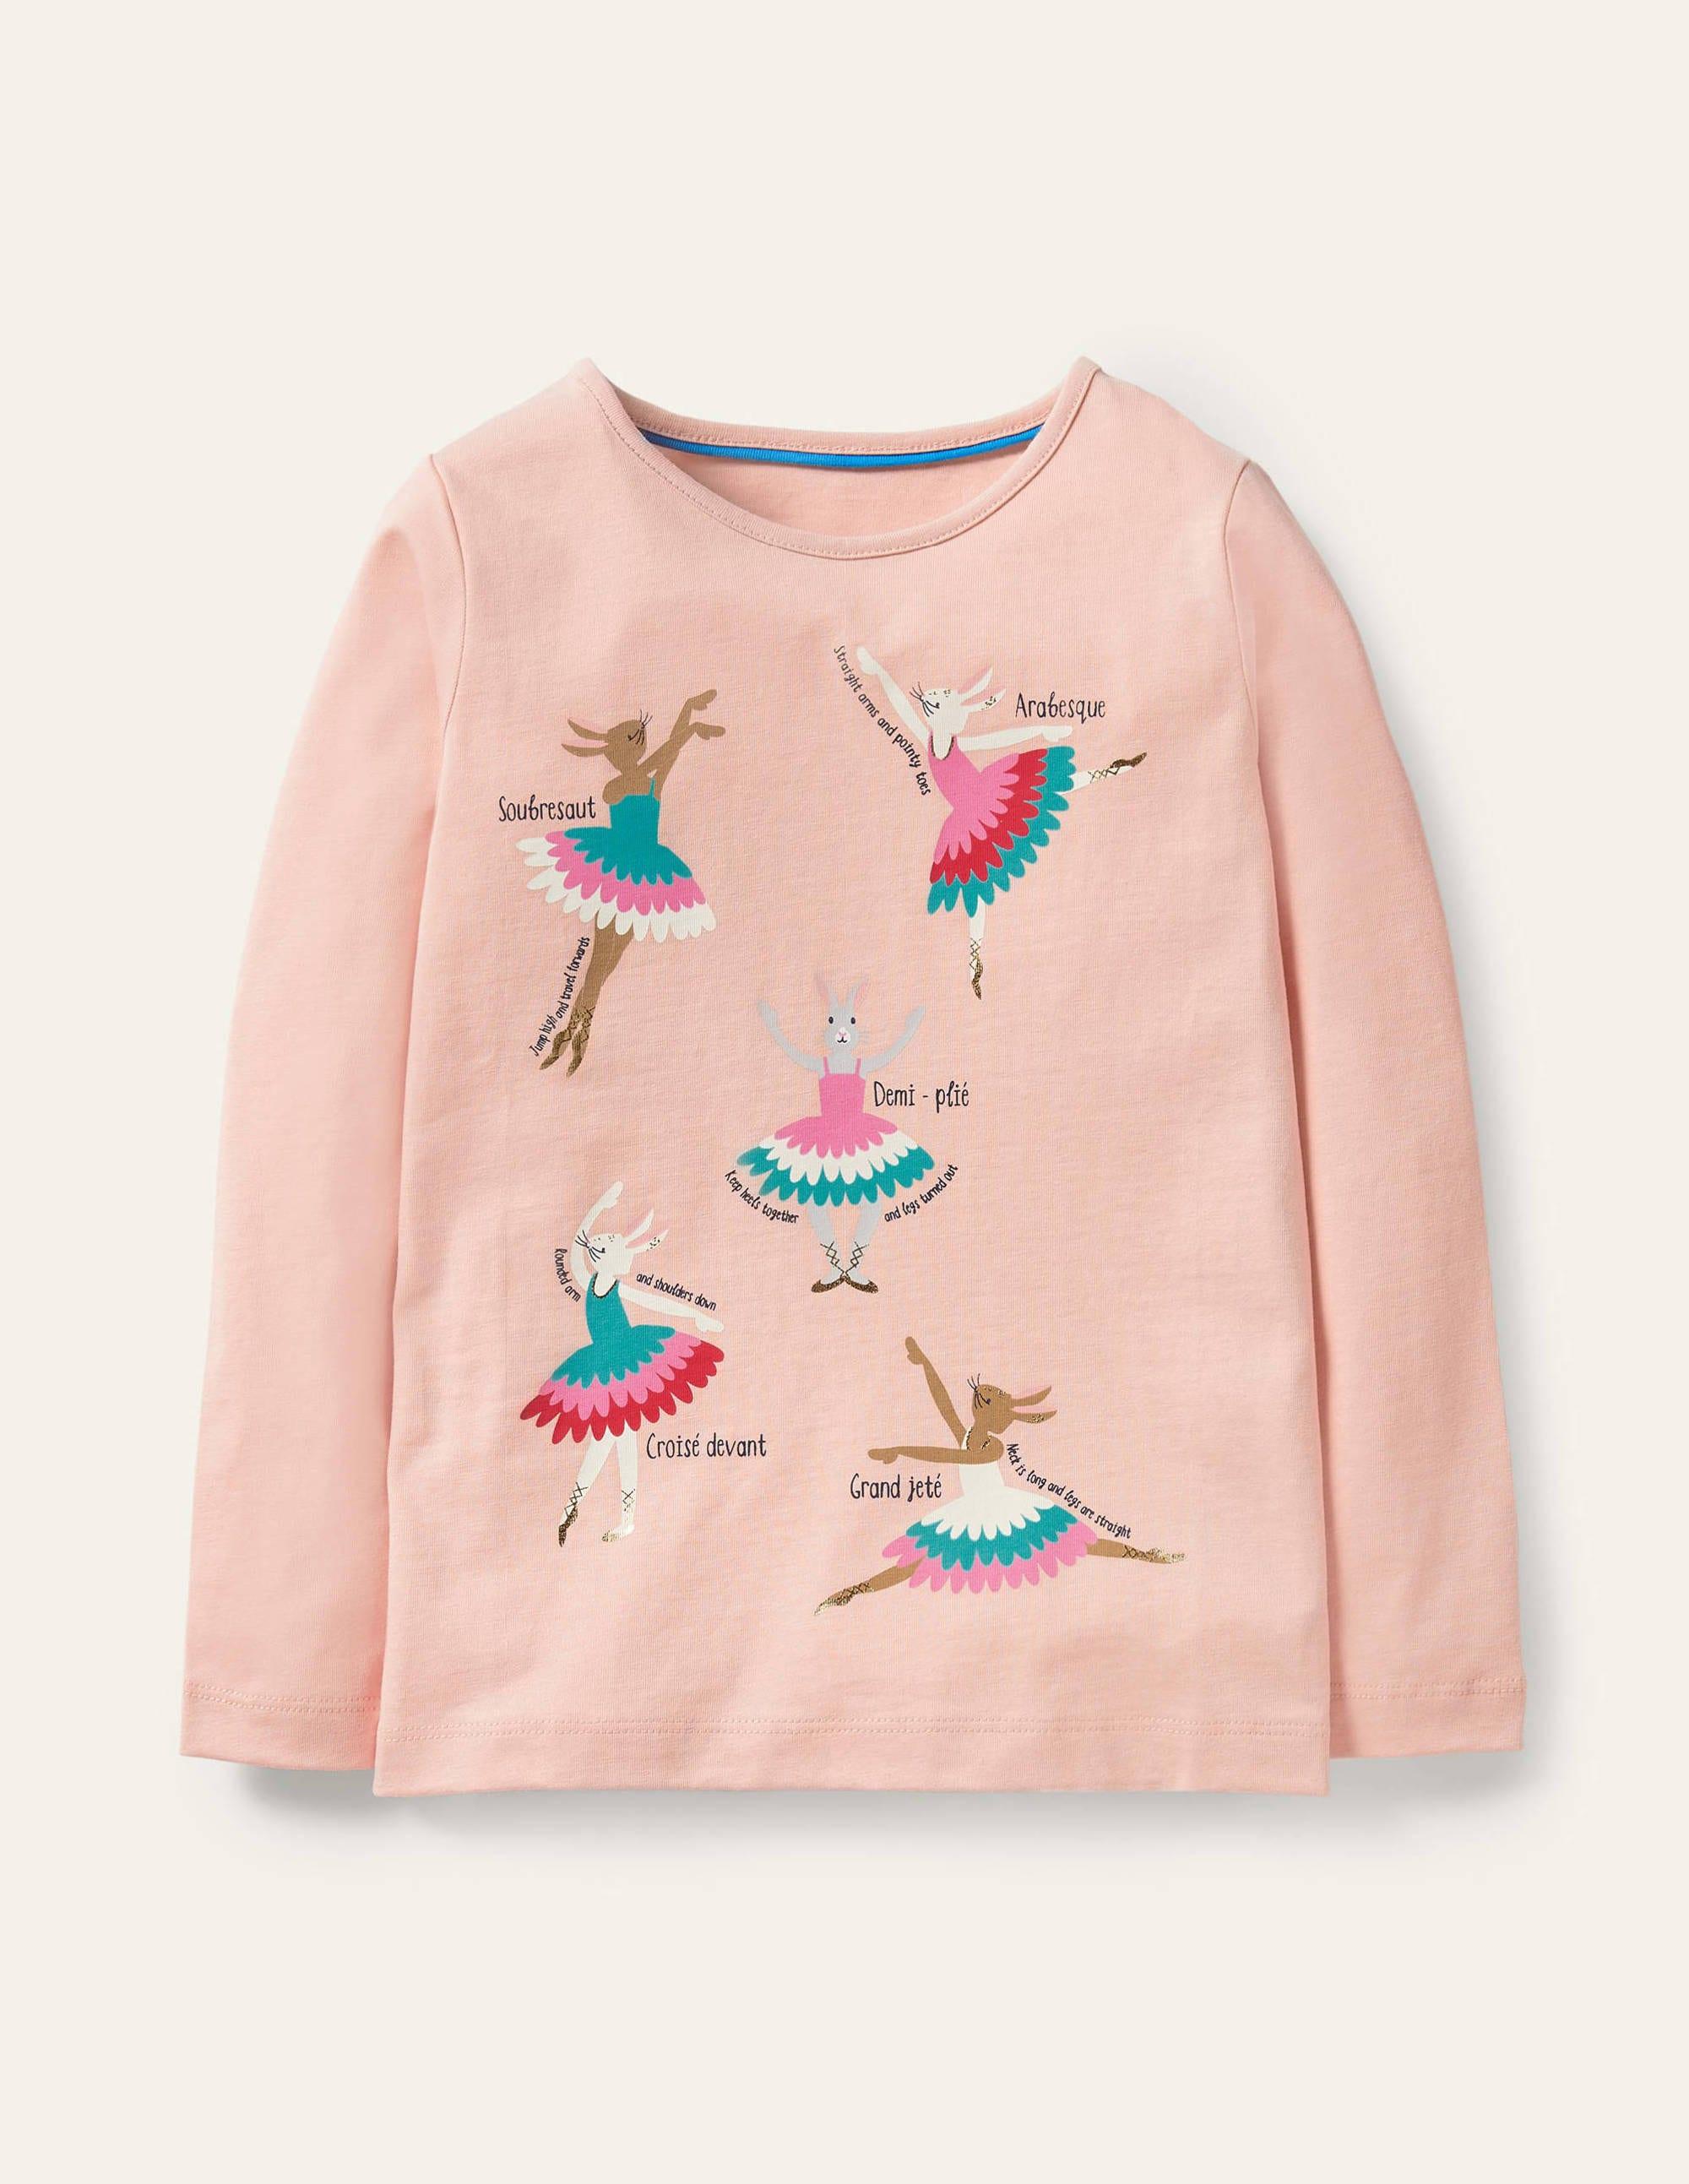 Boden Fun Facts T-shirt - Provence Dusty Pink Ballerinas